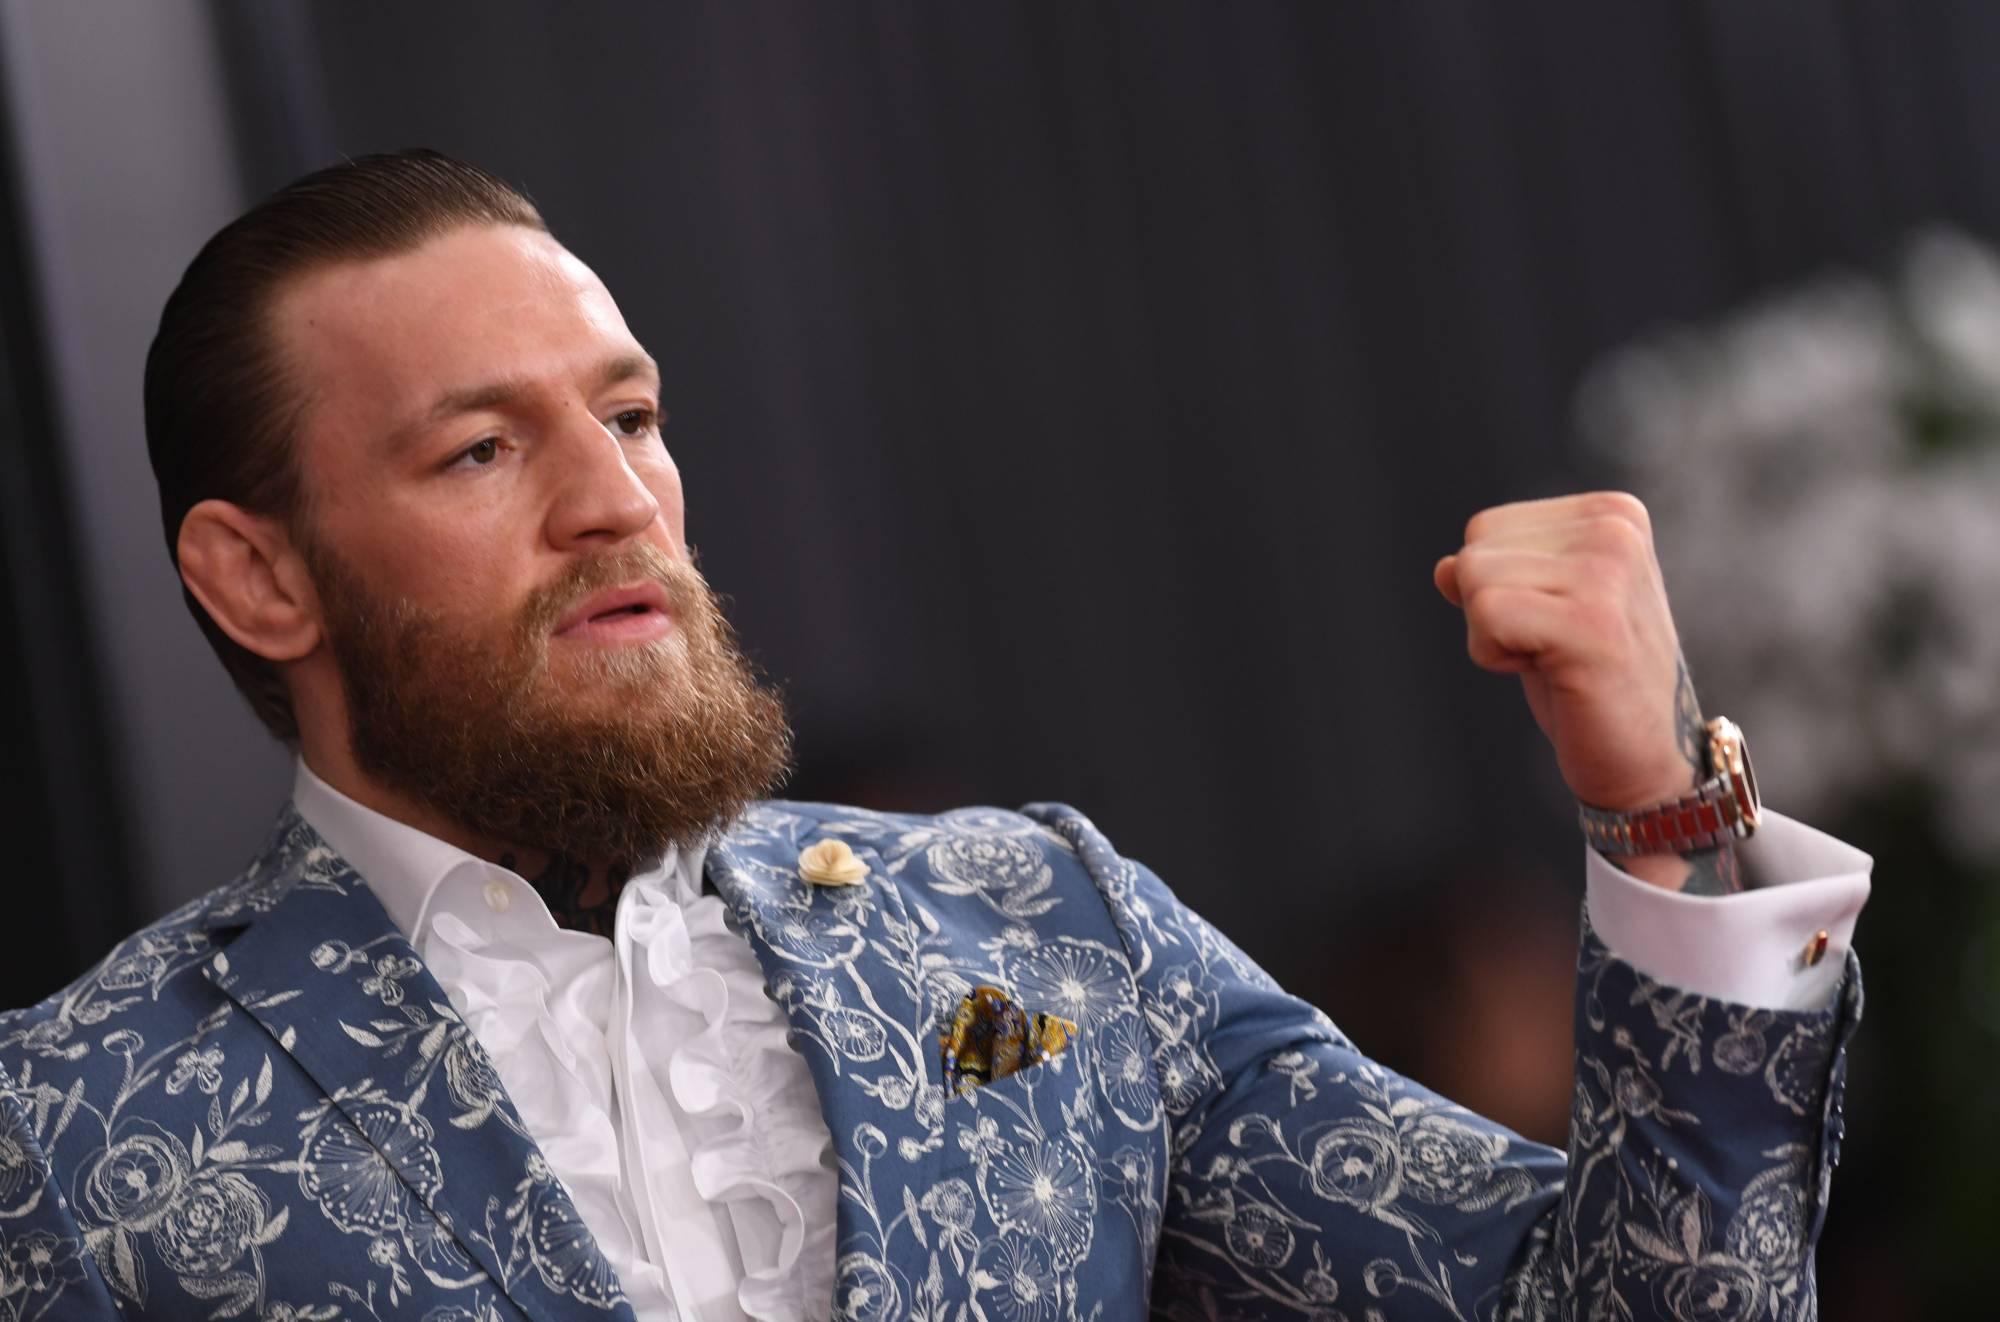 Conor McGregor accused of breaking DJ's nose in Rome